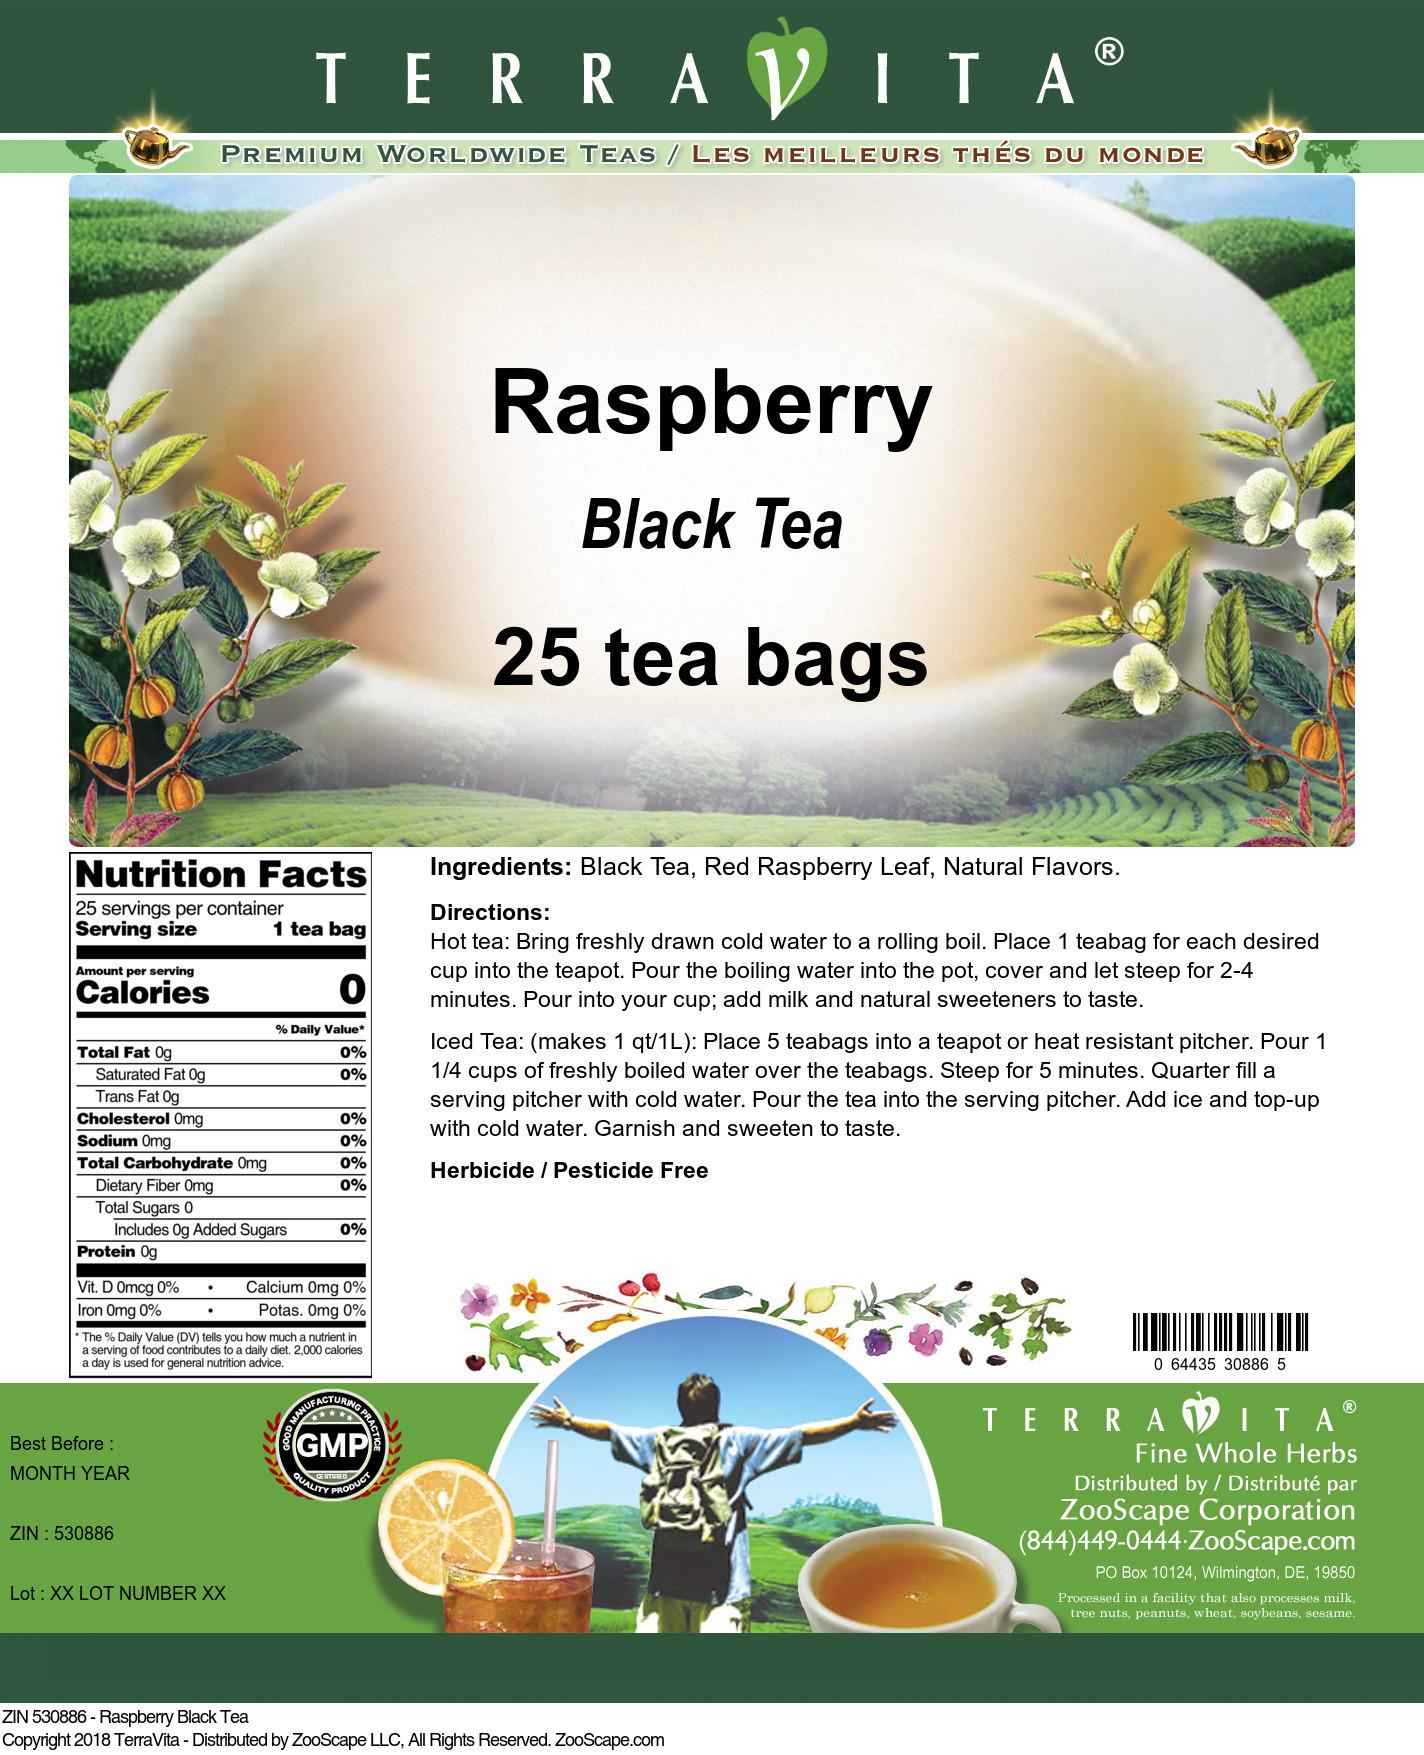 Raspberry Black Tea